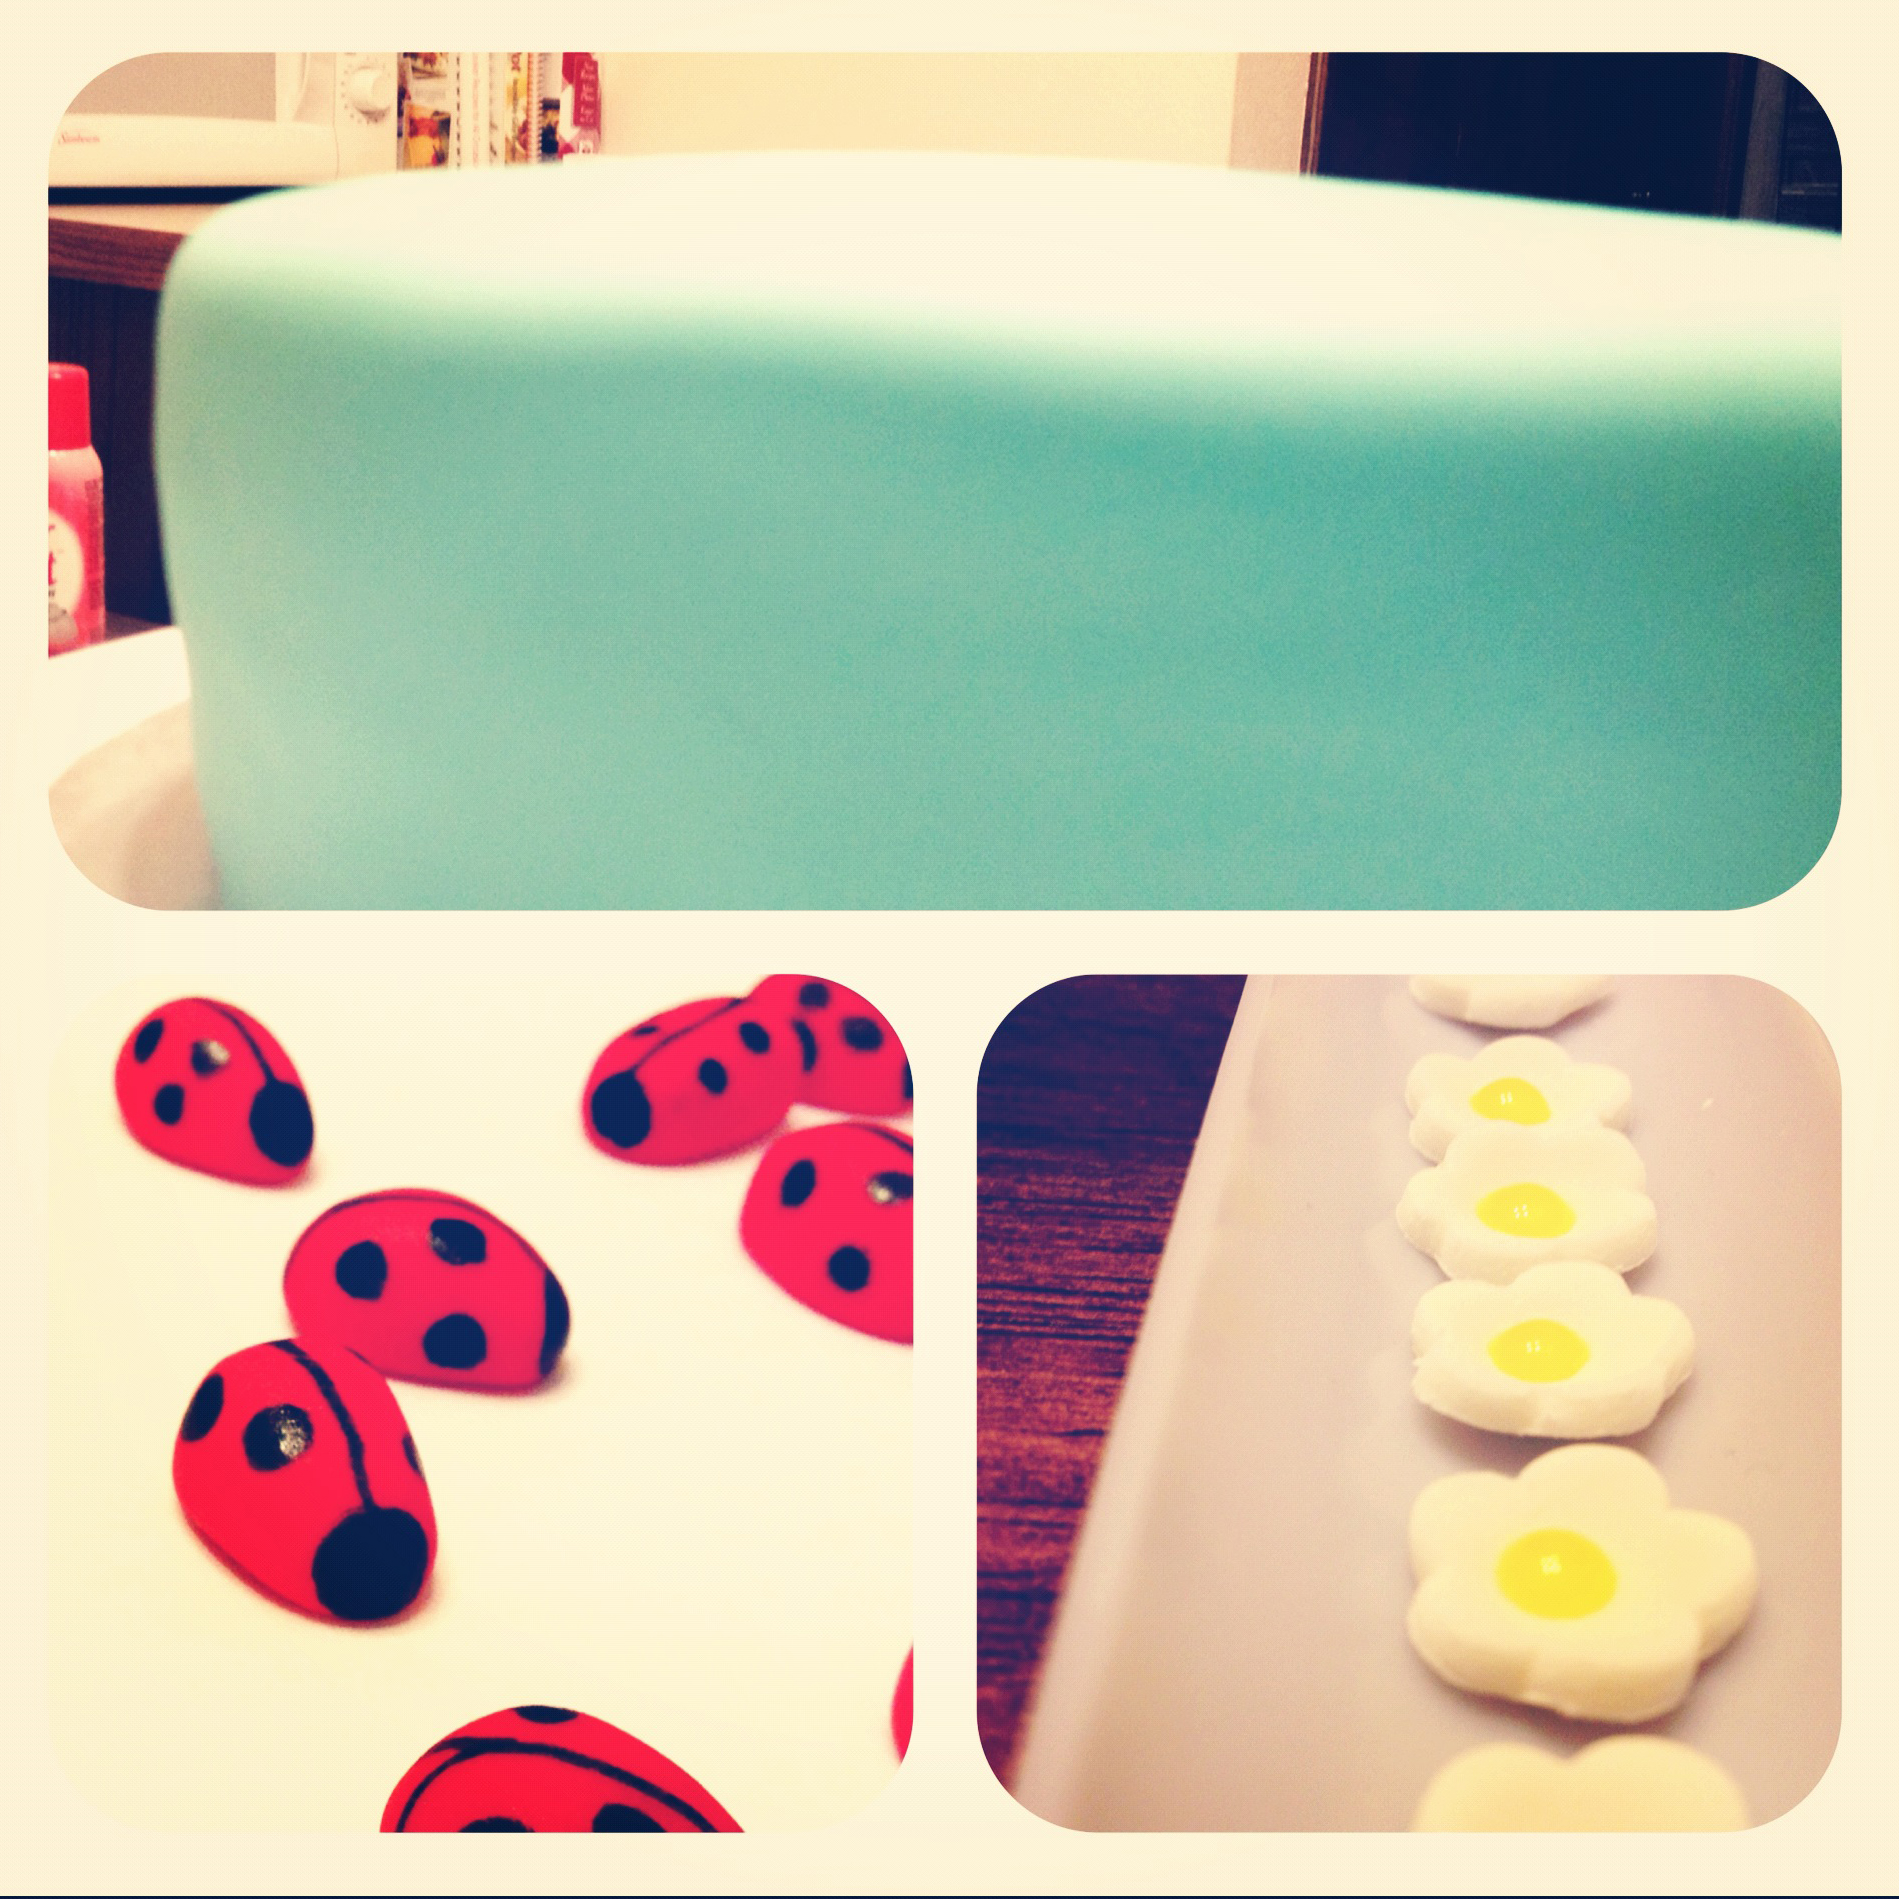 Ladybug Cake Sneak Peek!